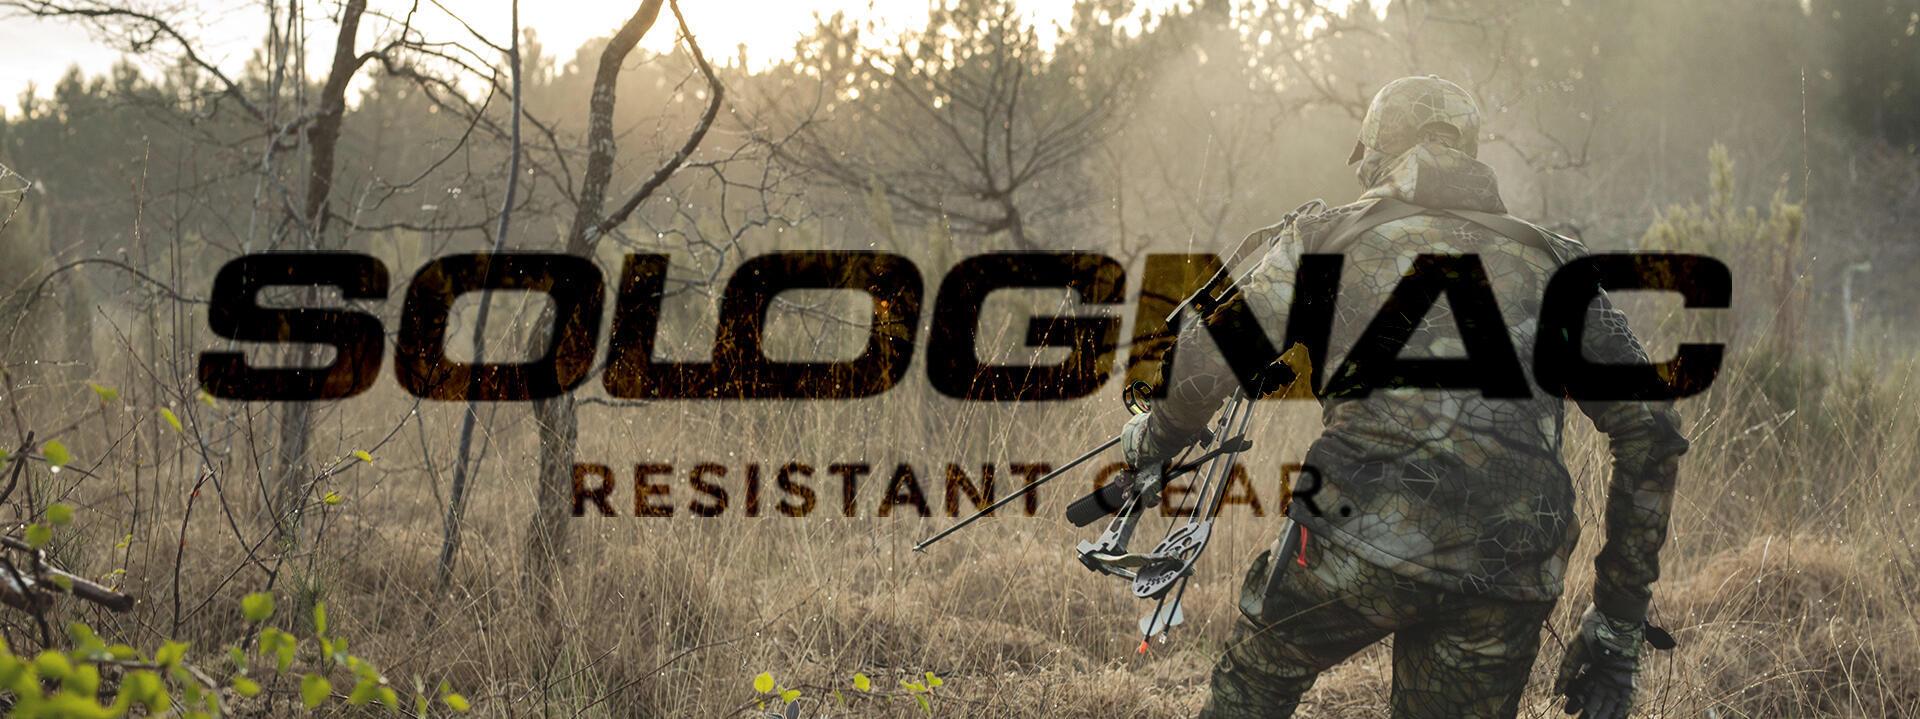 Solognac resistant gear